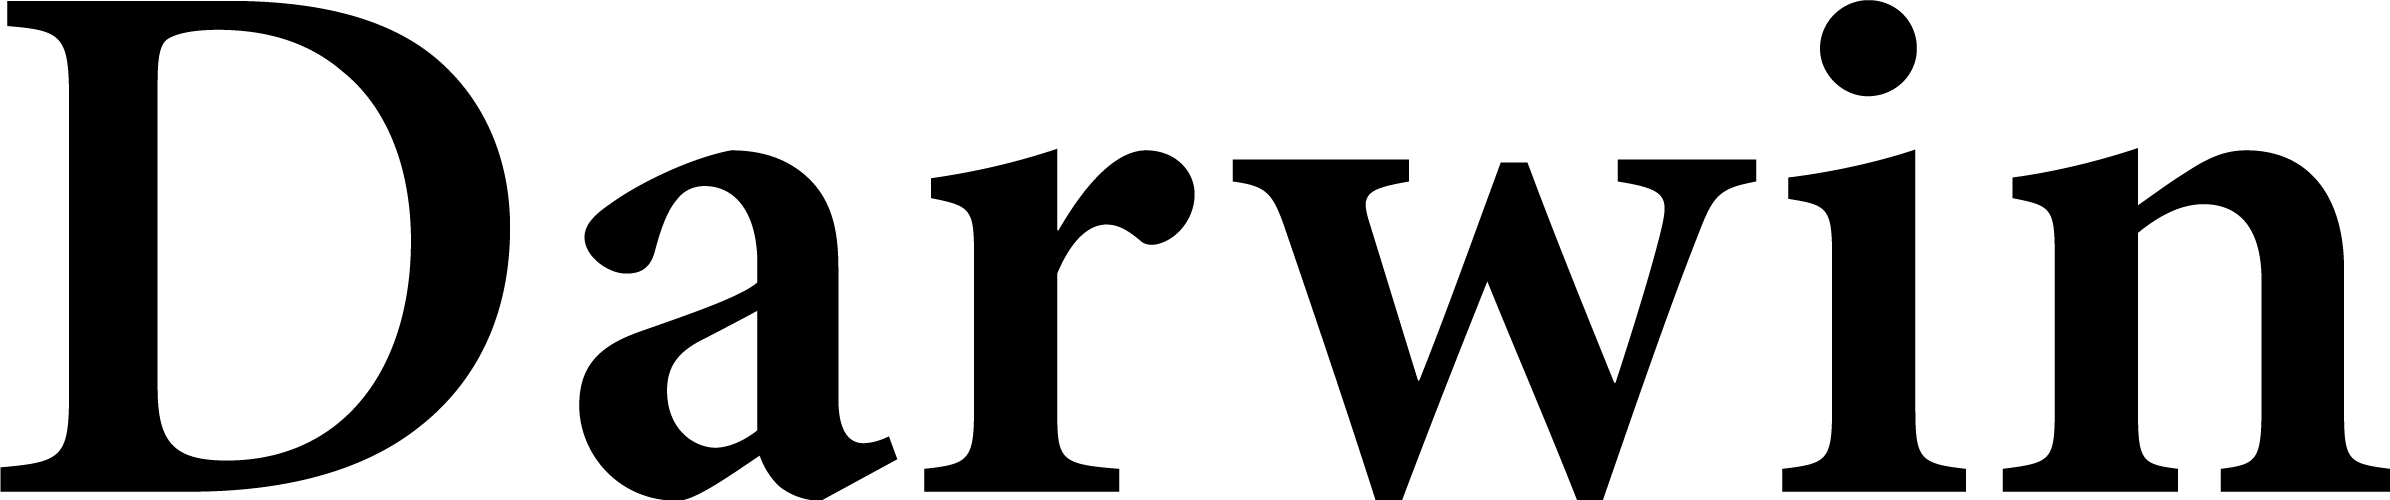 V7 Darwin logo